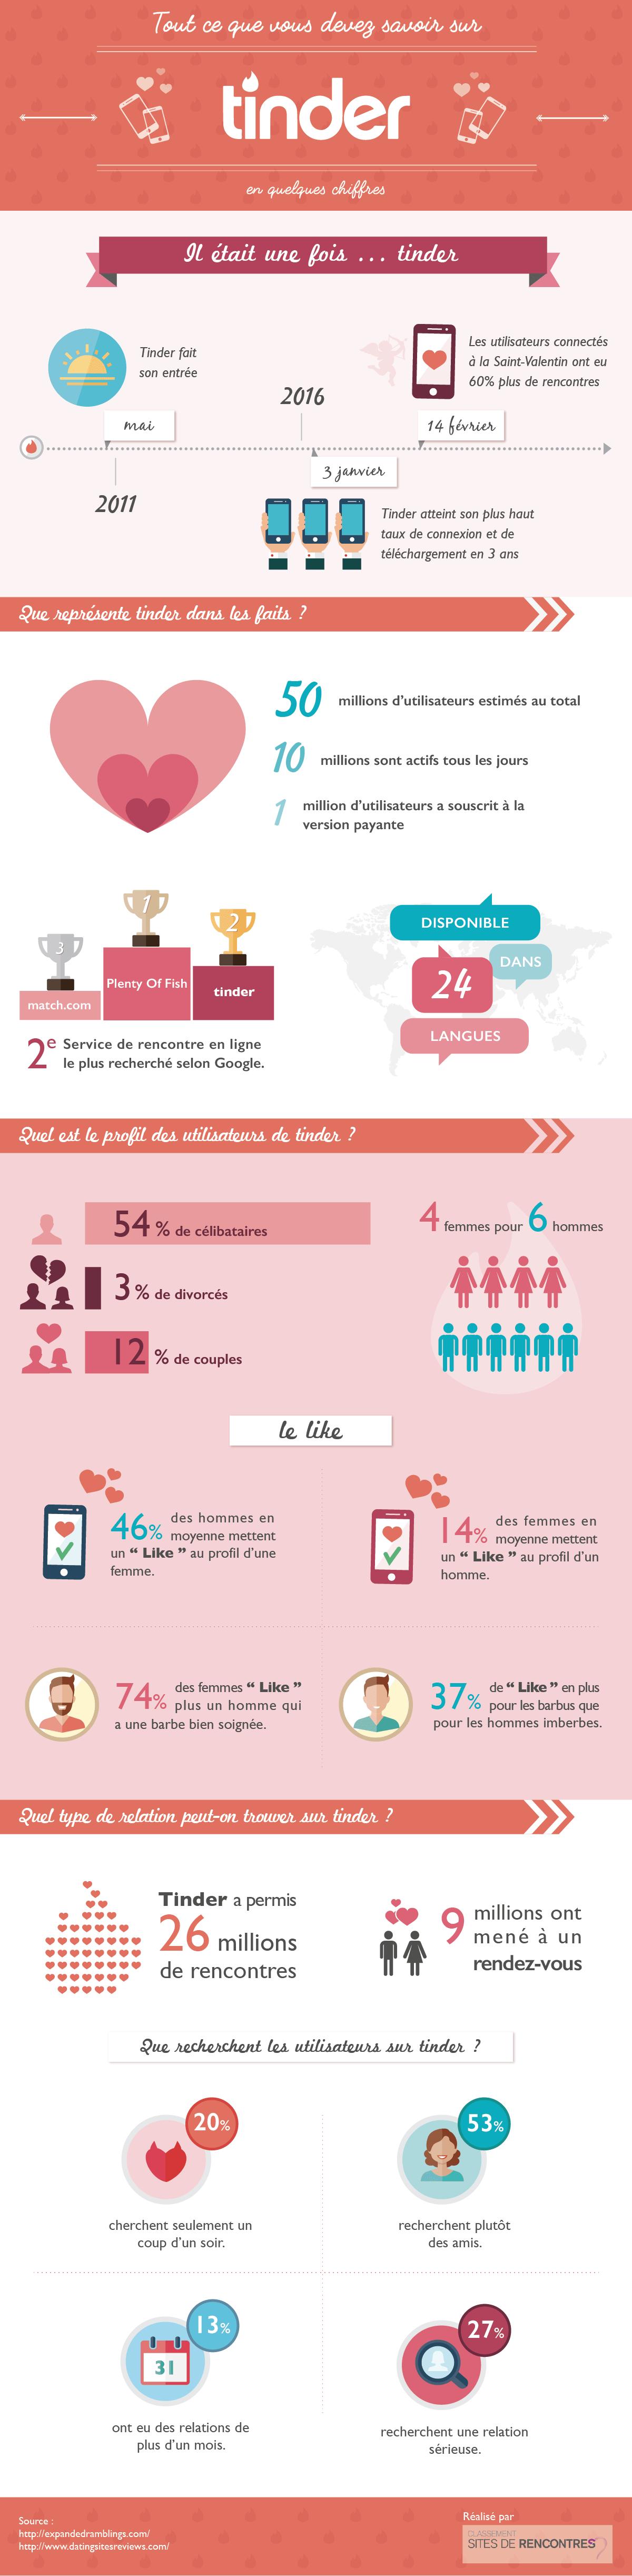 Infographie chiffres Tinder